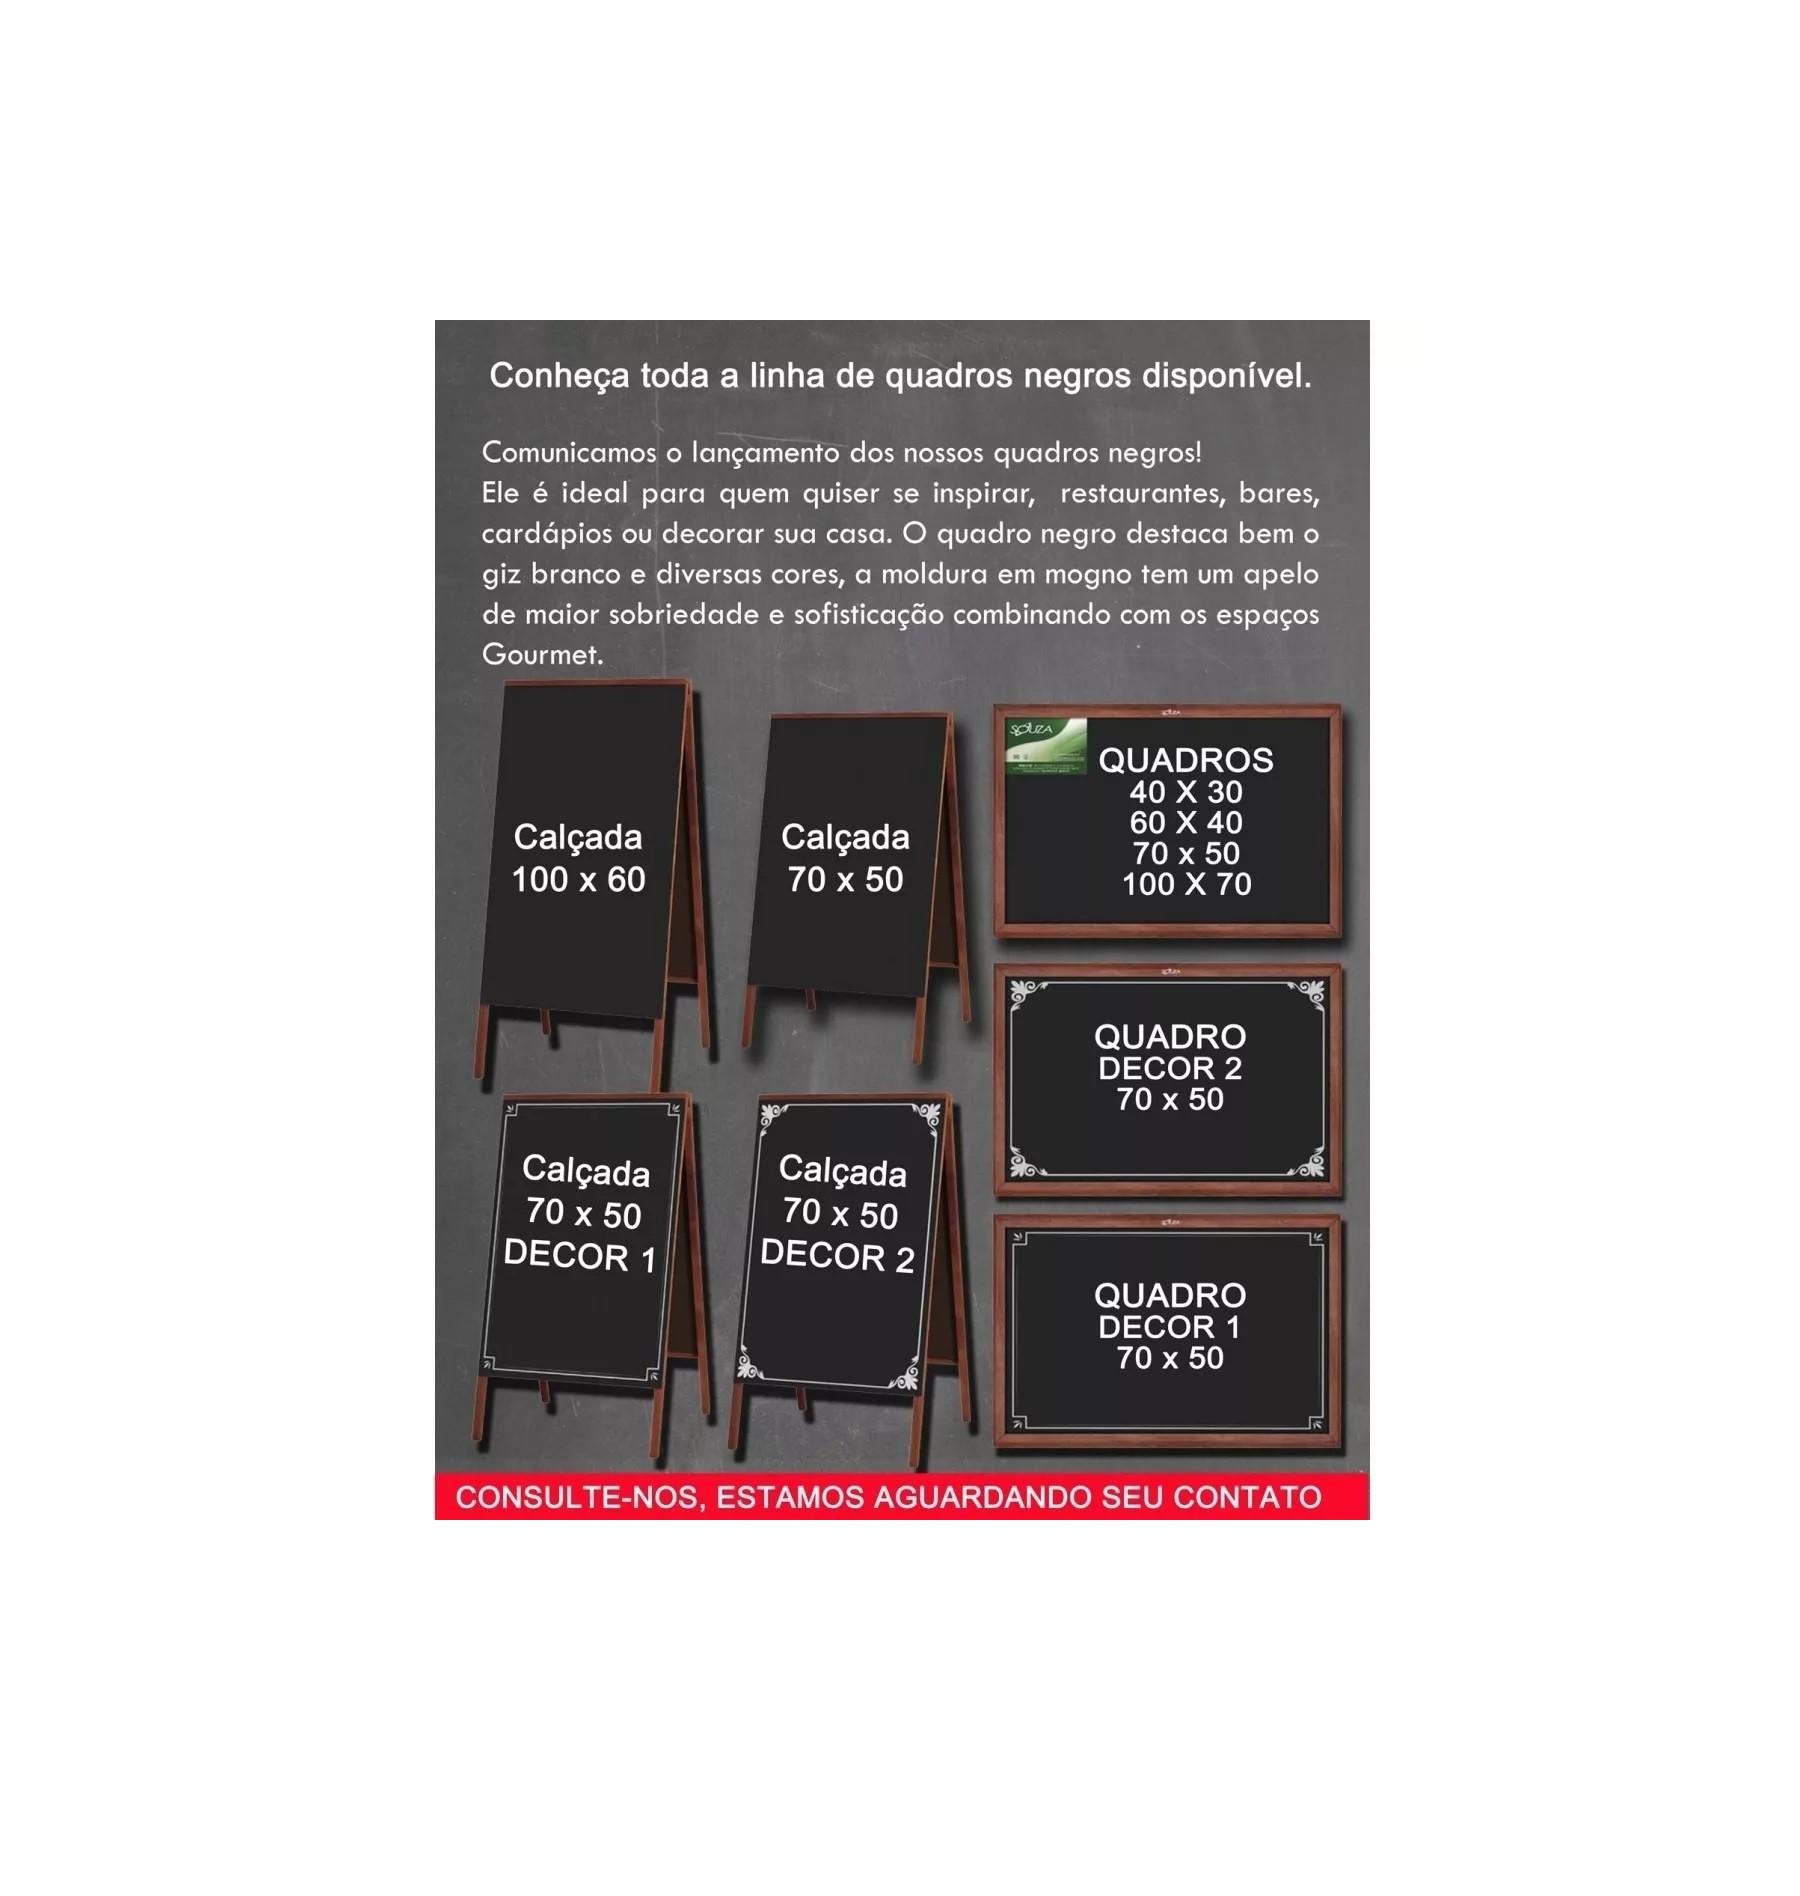 Quadro Negro 70 X 50 cm Moldura Madeira Cor Mogno Referência 2103 SOUZA